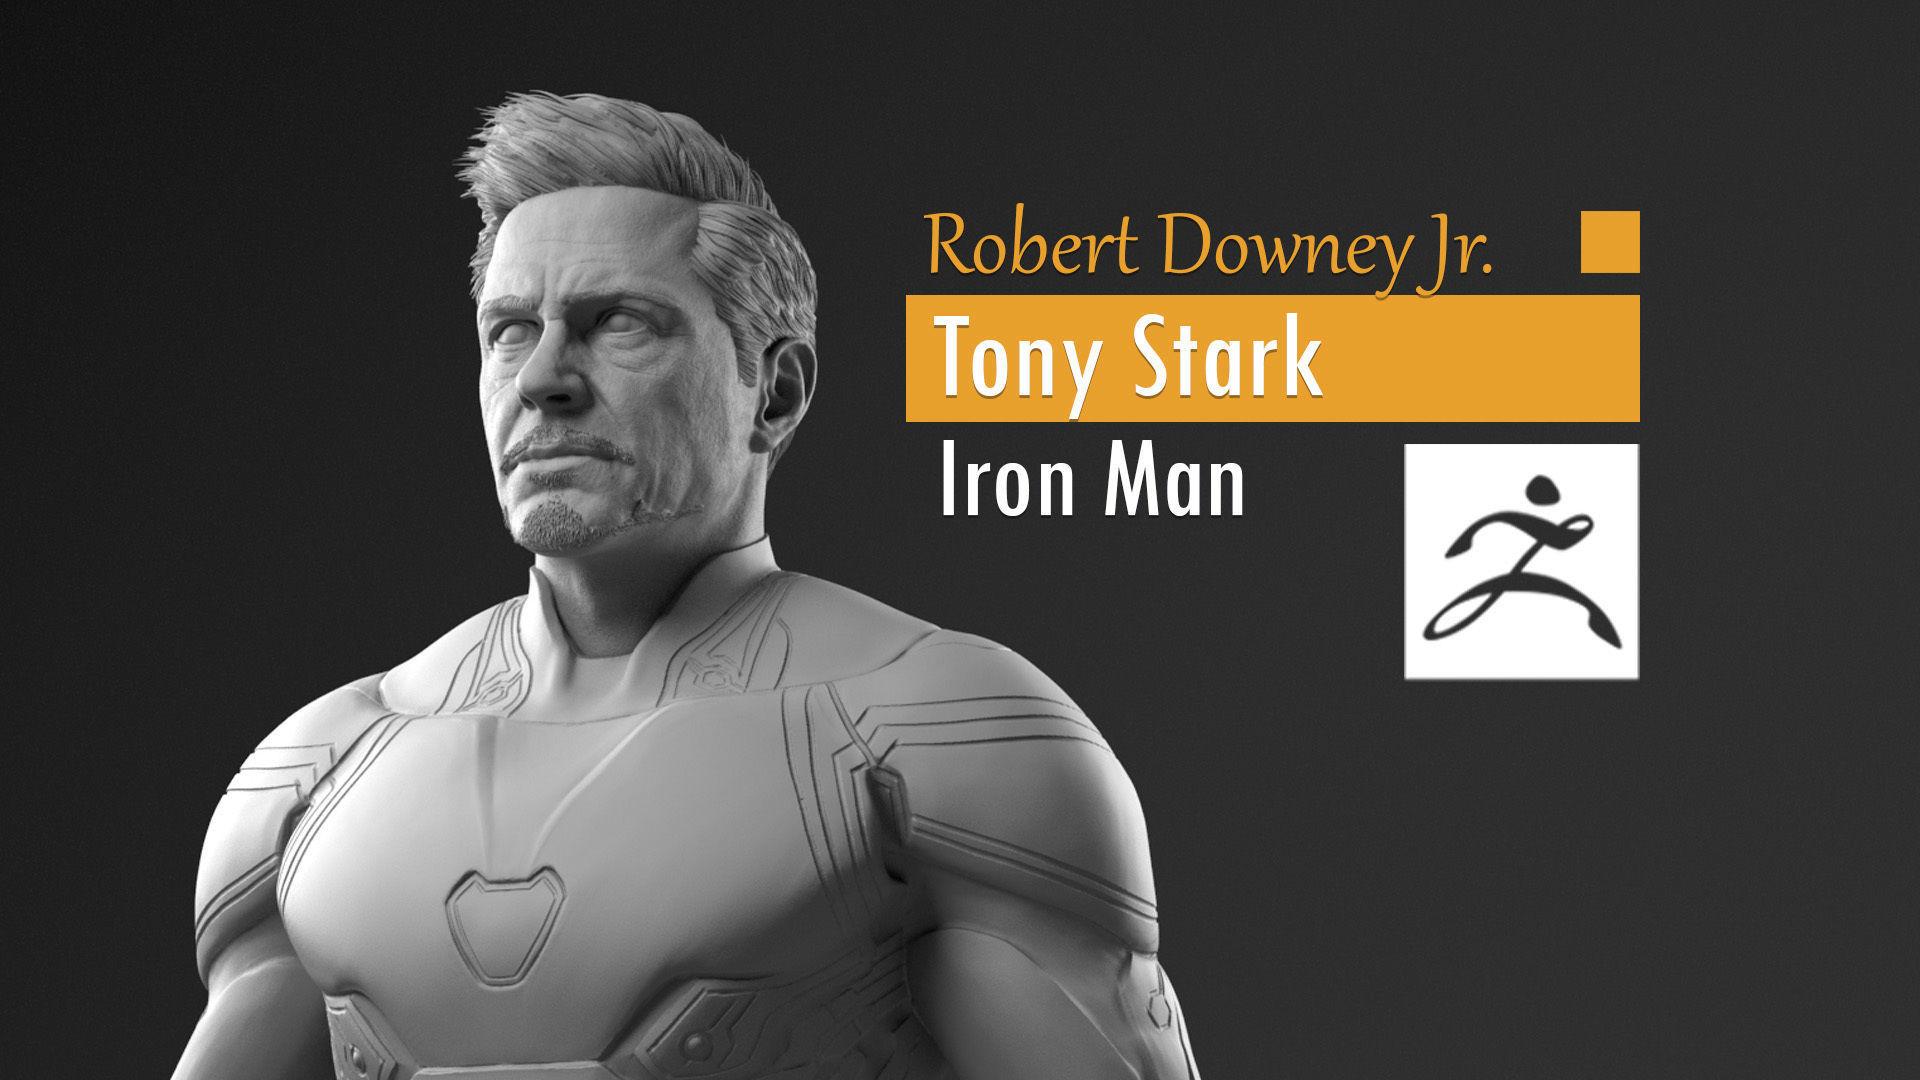 Robert Downey Jr - Tony Stark - Iron Man